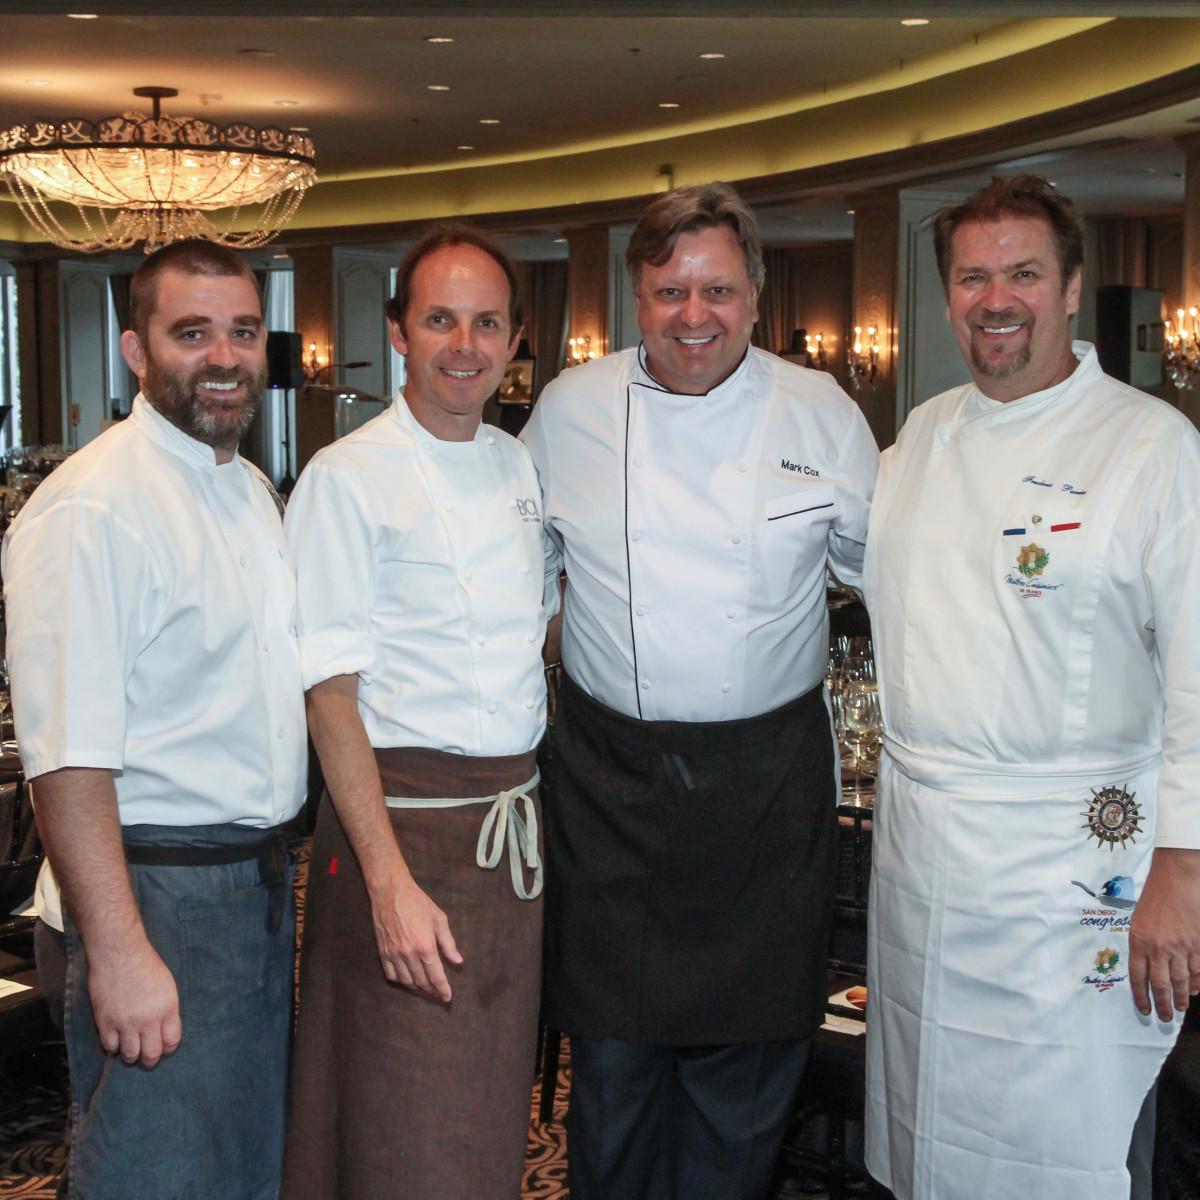 Best Cellars Wine Dinner/Bobby Matos, Luis Roger, Mark Cox, Frederic Perrier